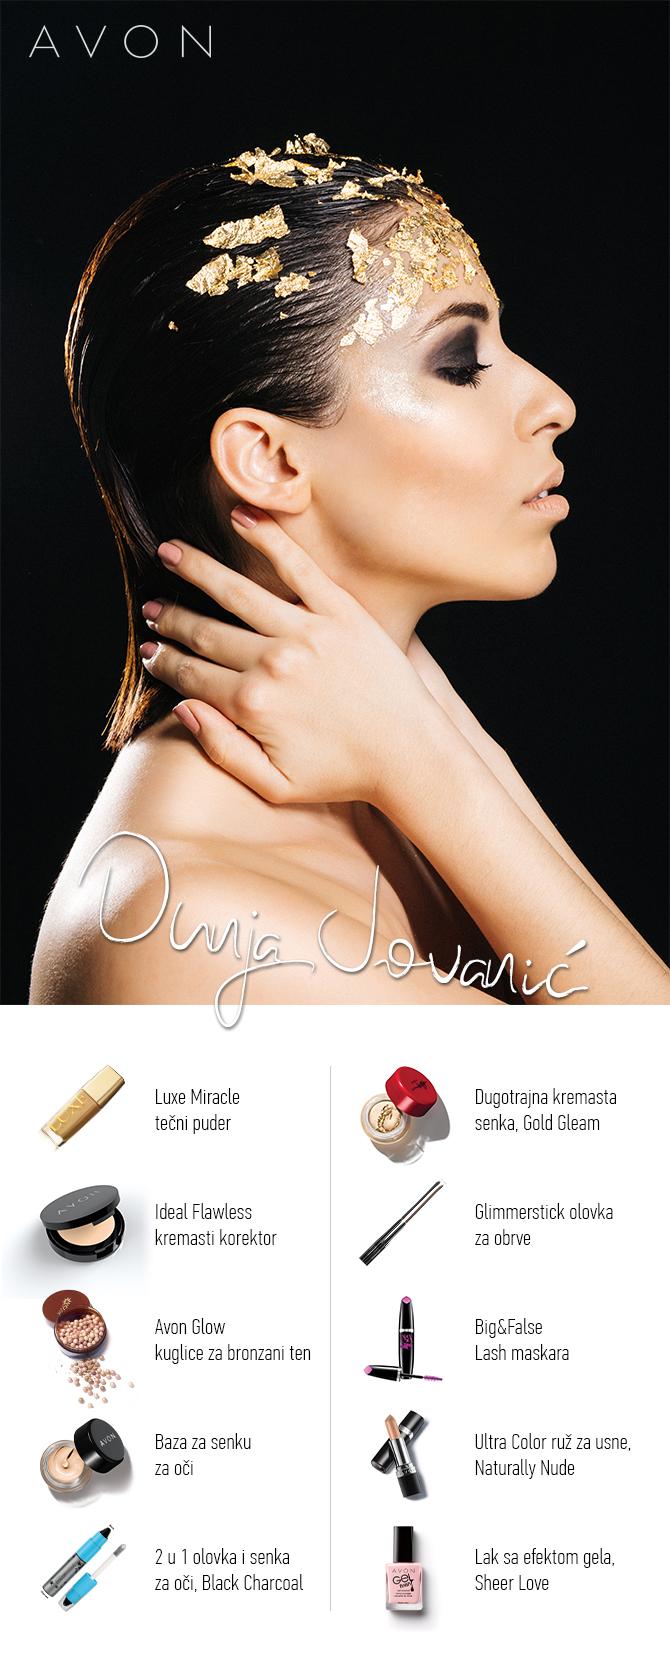 Dunja Jovanic ISKOPIRAJ makeup modnih blogerki: GLAMUROZAN look